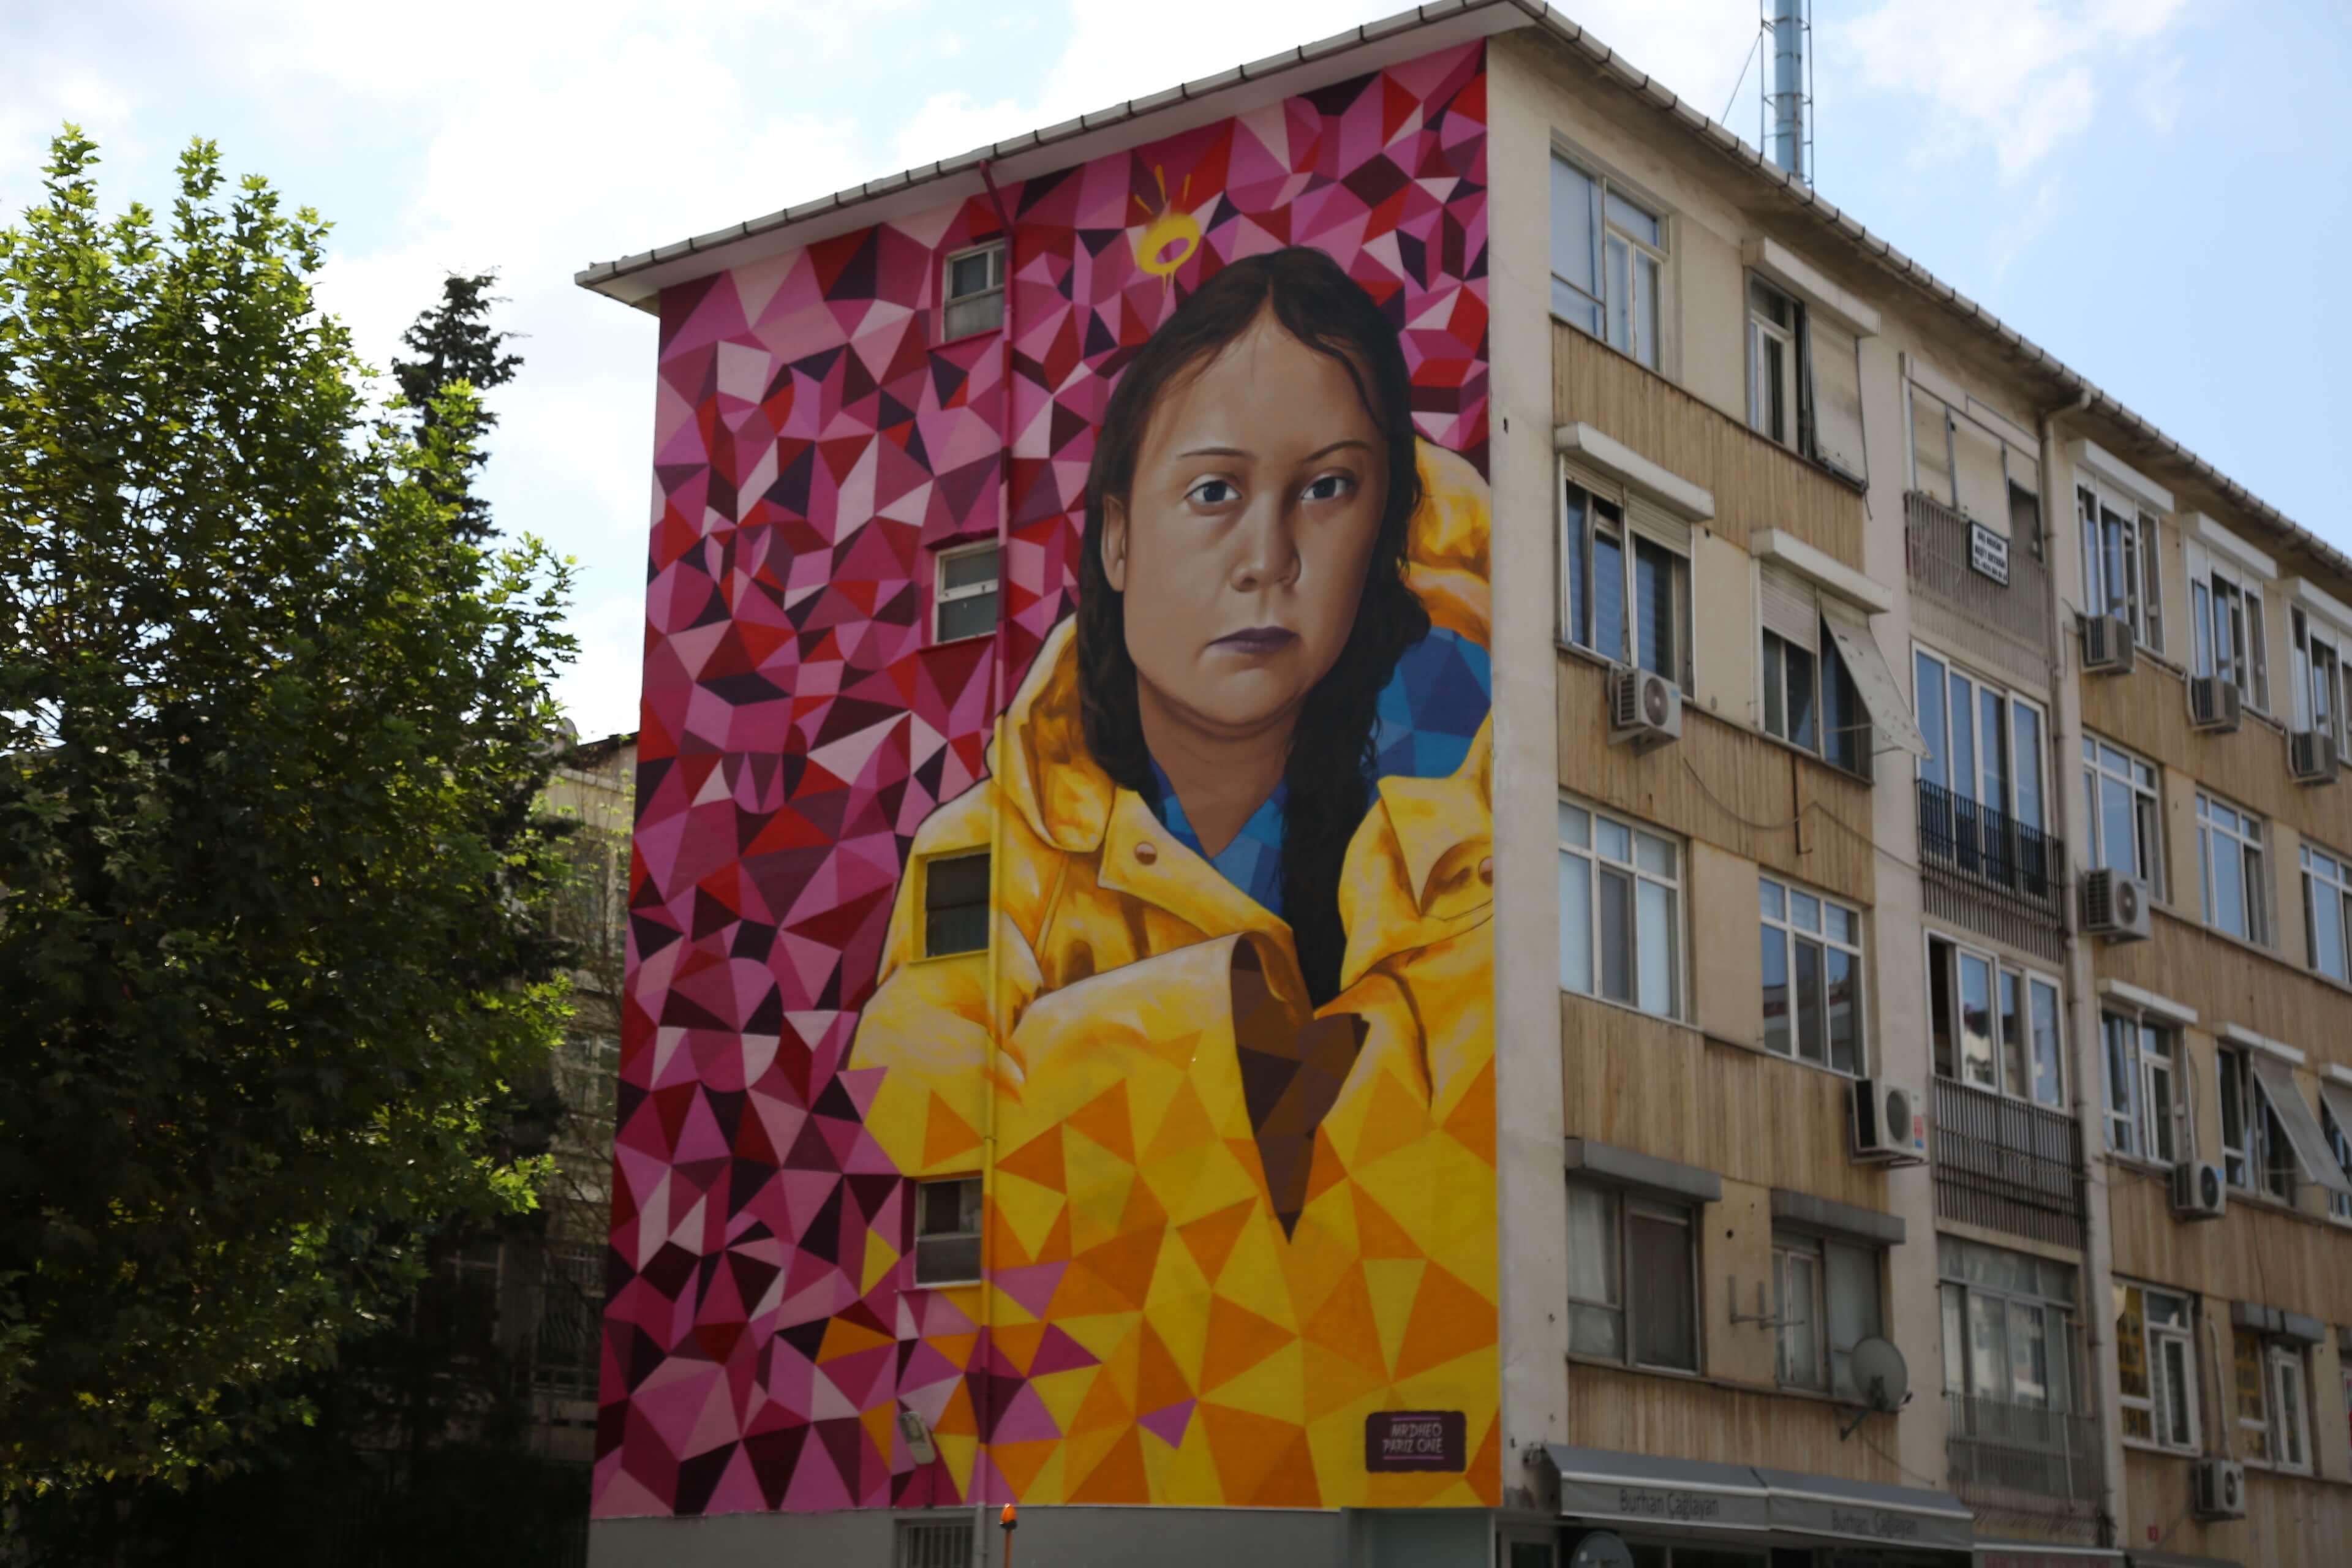 16 Yaşındaki İklim Aktivisti Greta Thunberg Kadıköy Duvarlarında